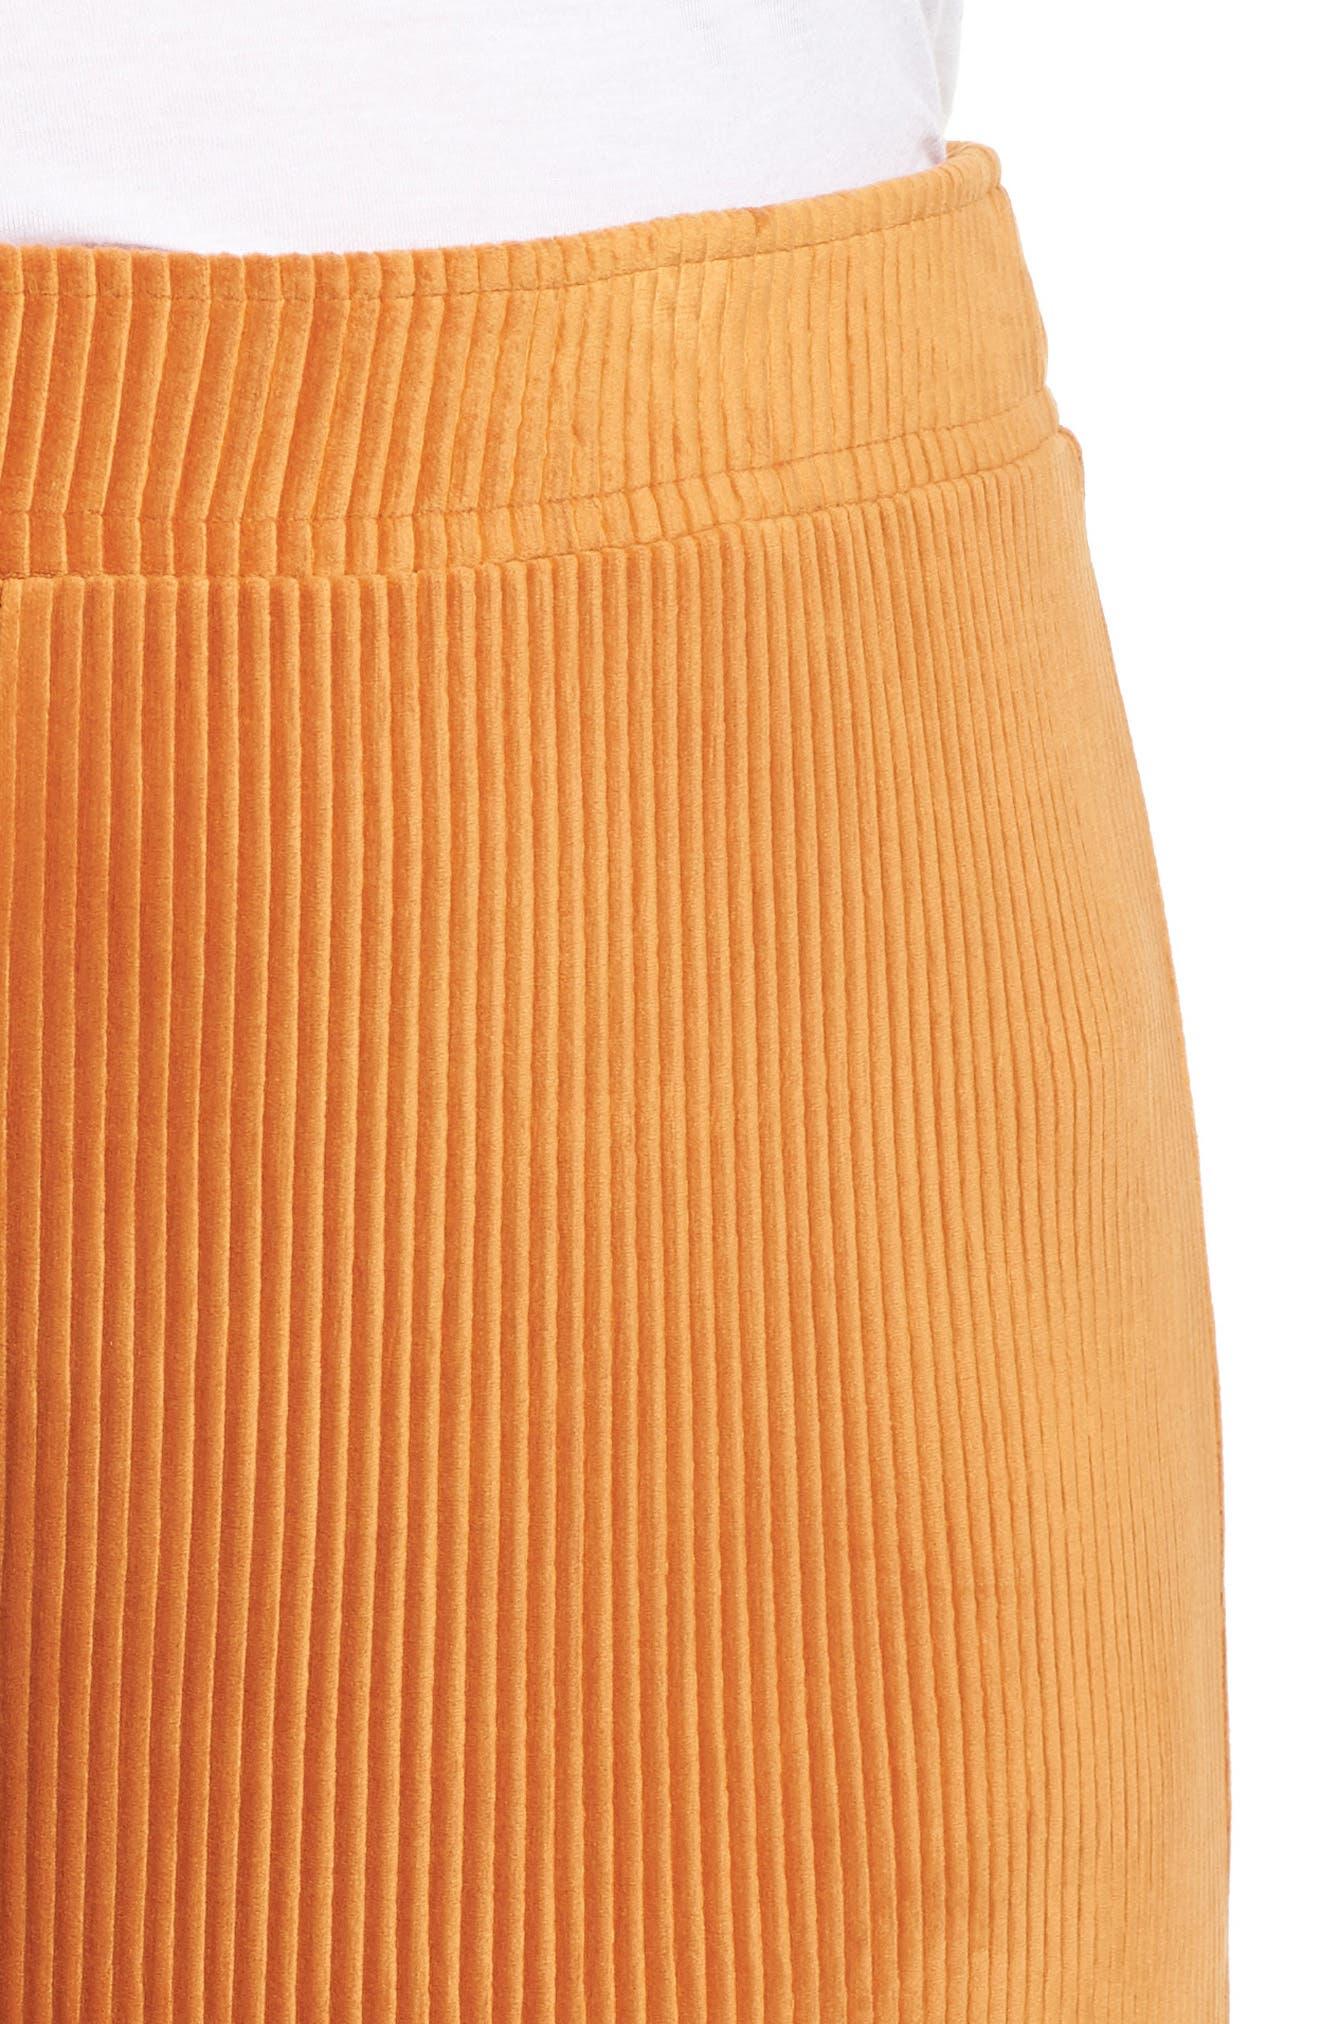 High Rise Knit Corduroy Crop Pants,                             Alternate thumbnail 11, color,                             RUST CIDER